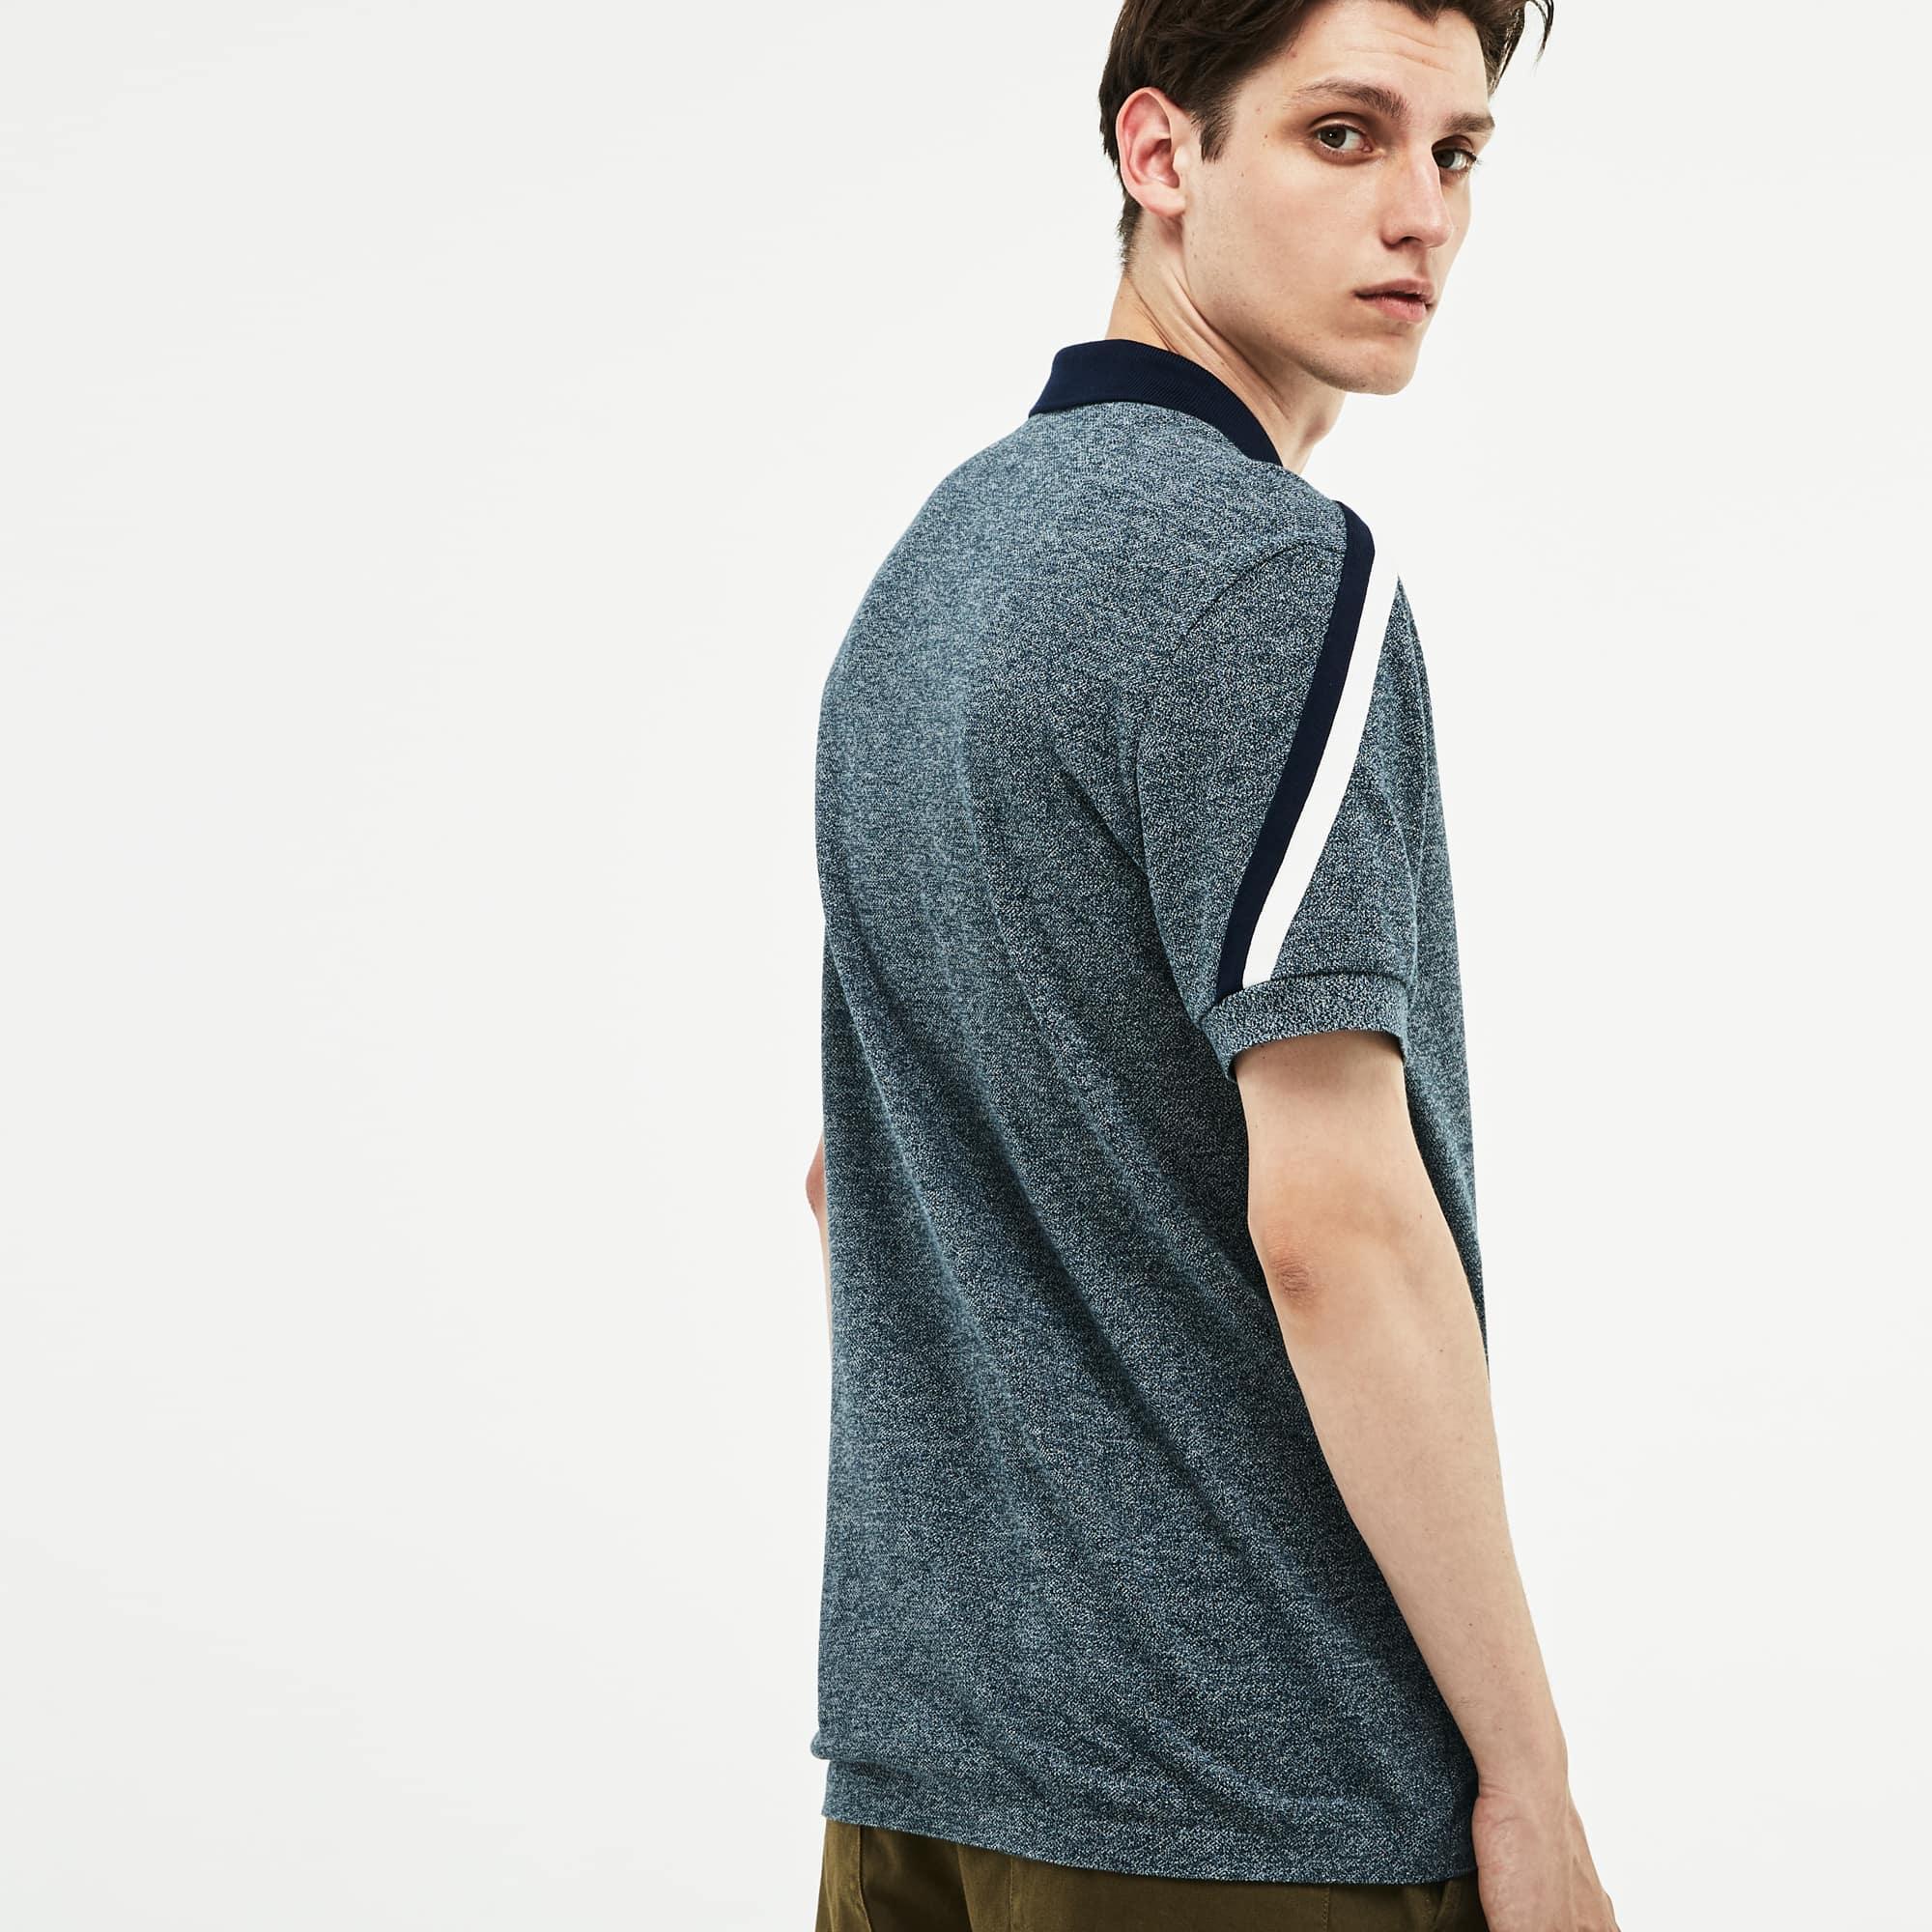 Lacoste - LACOSTE Made In France Regular Fit Herren-Poloshirt aus Baumwoll-Piqué - 2